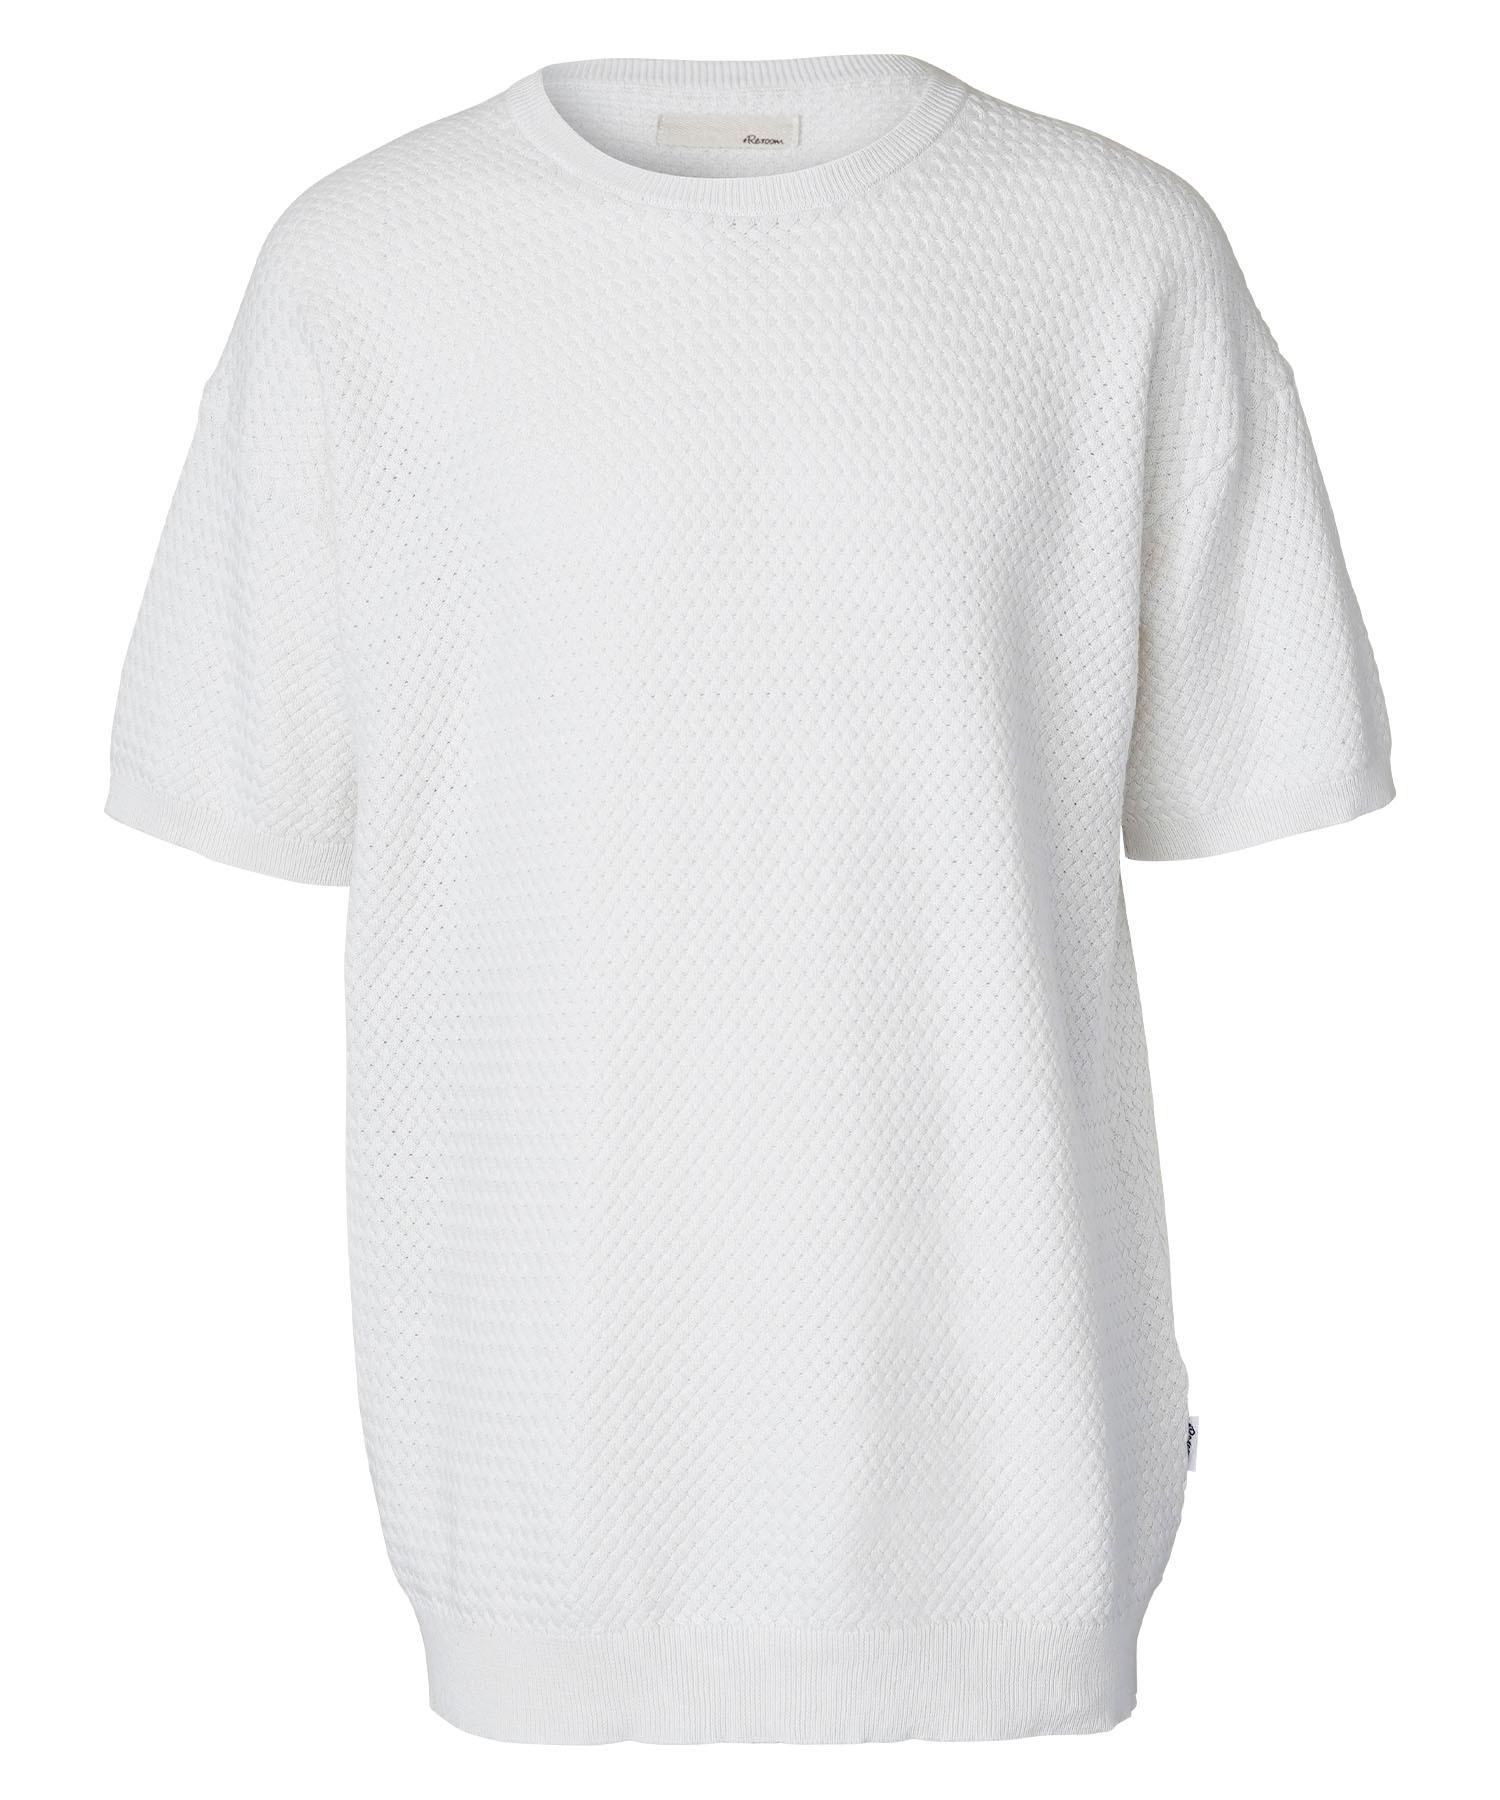 INTRECCIATO COTTON KNIT BIG T-shirt[REK091]